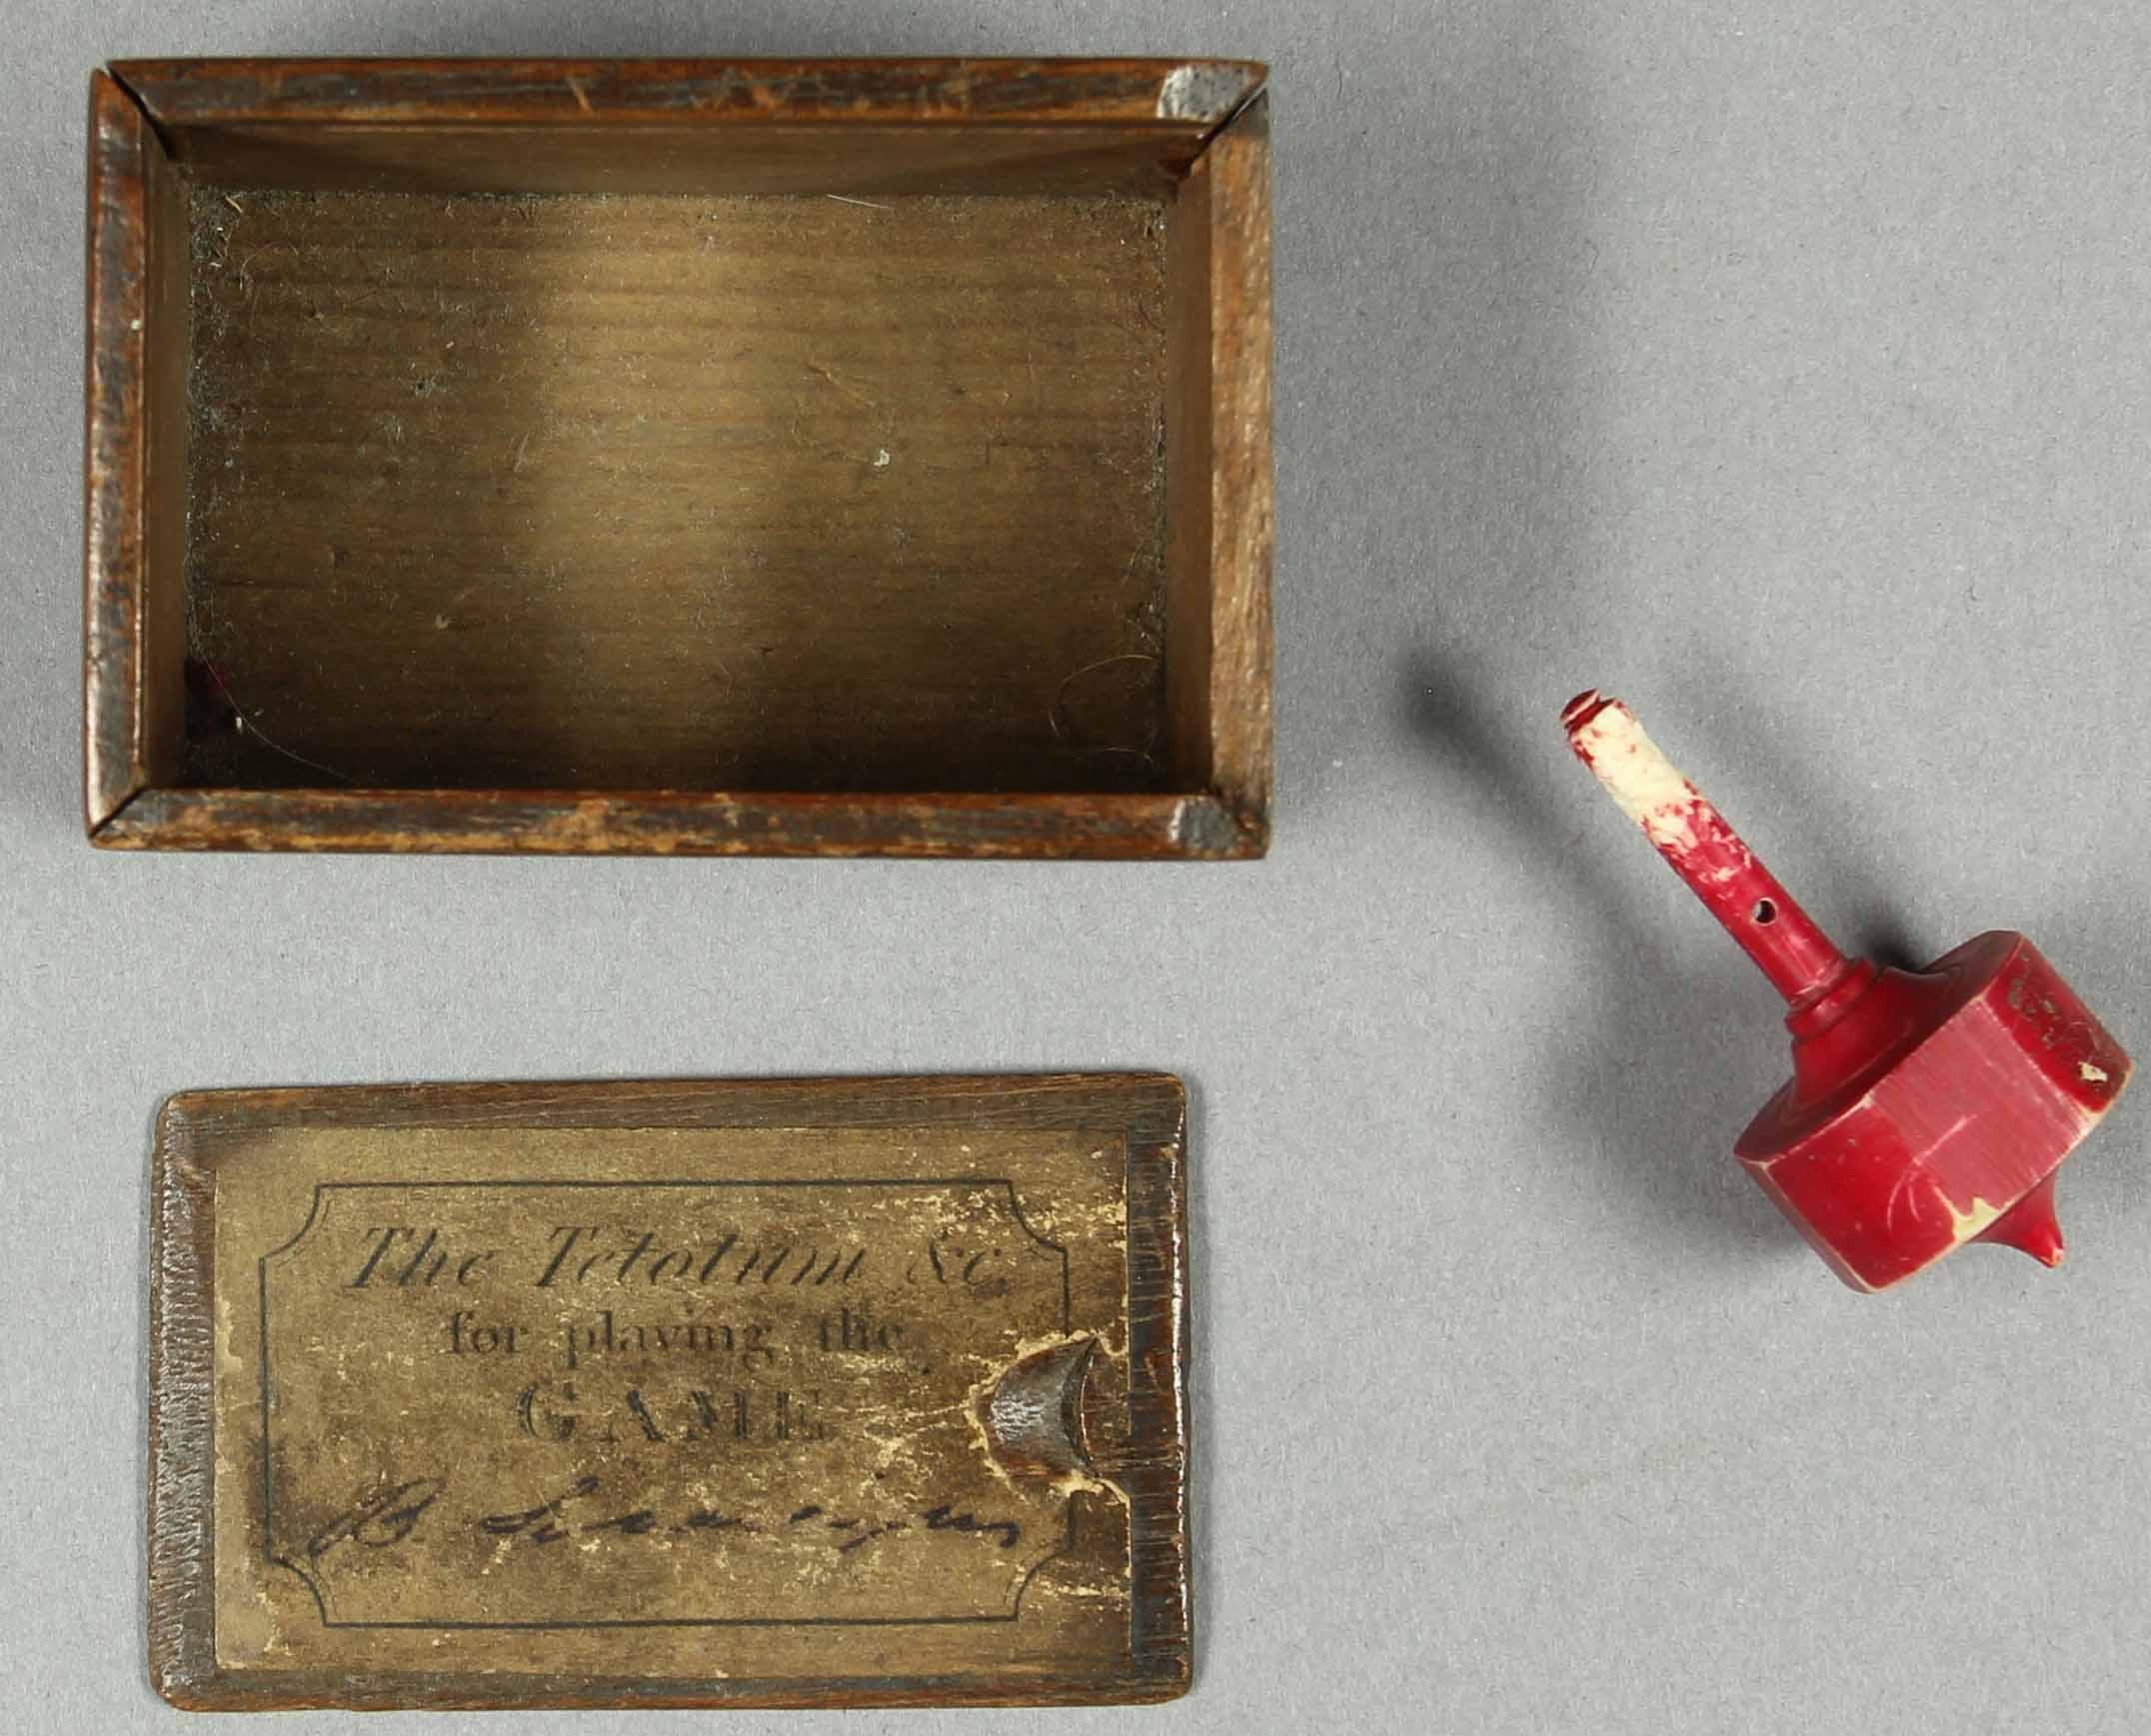 Tetotum in box, with 'British sovereigns written in manuscript on label